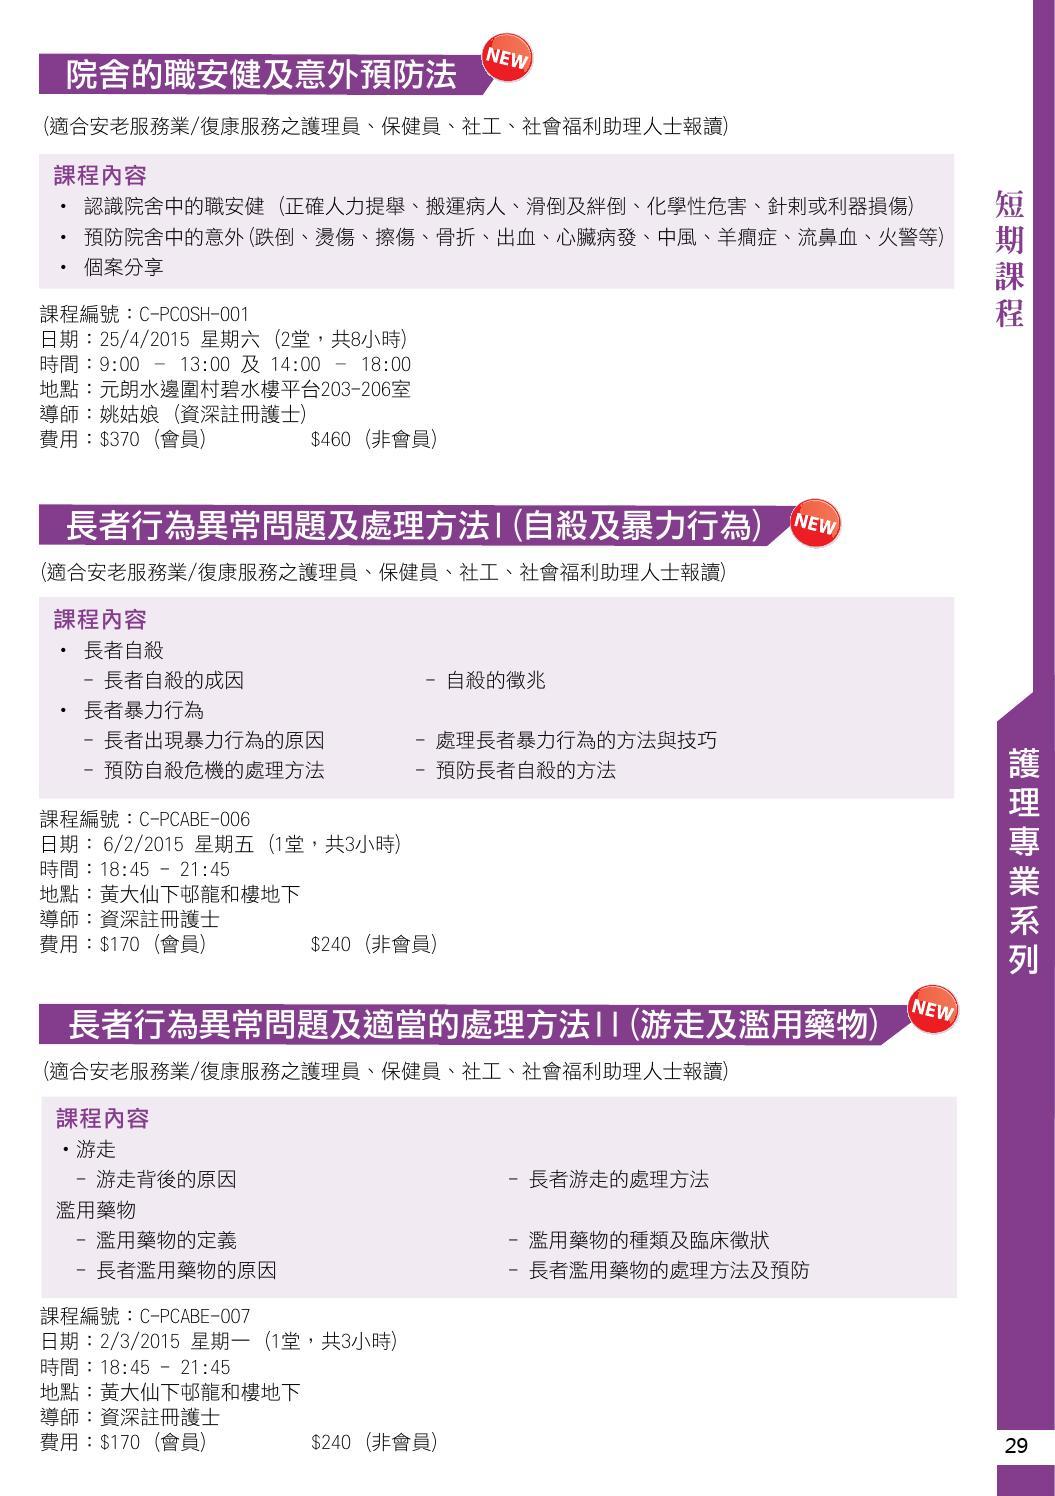 Cdp2015 by 香港職業發展服務處 - Issuu